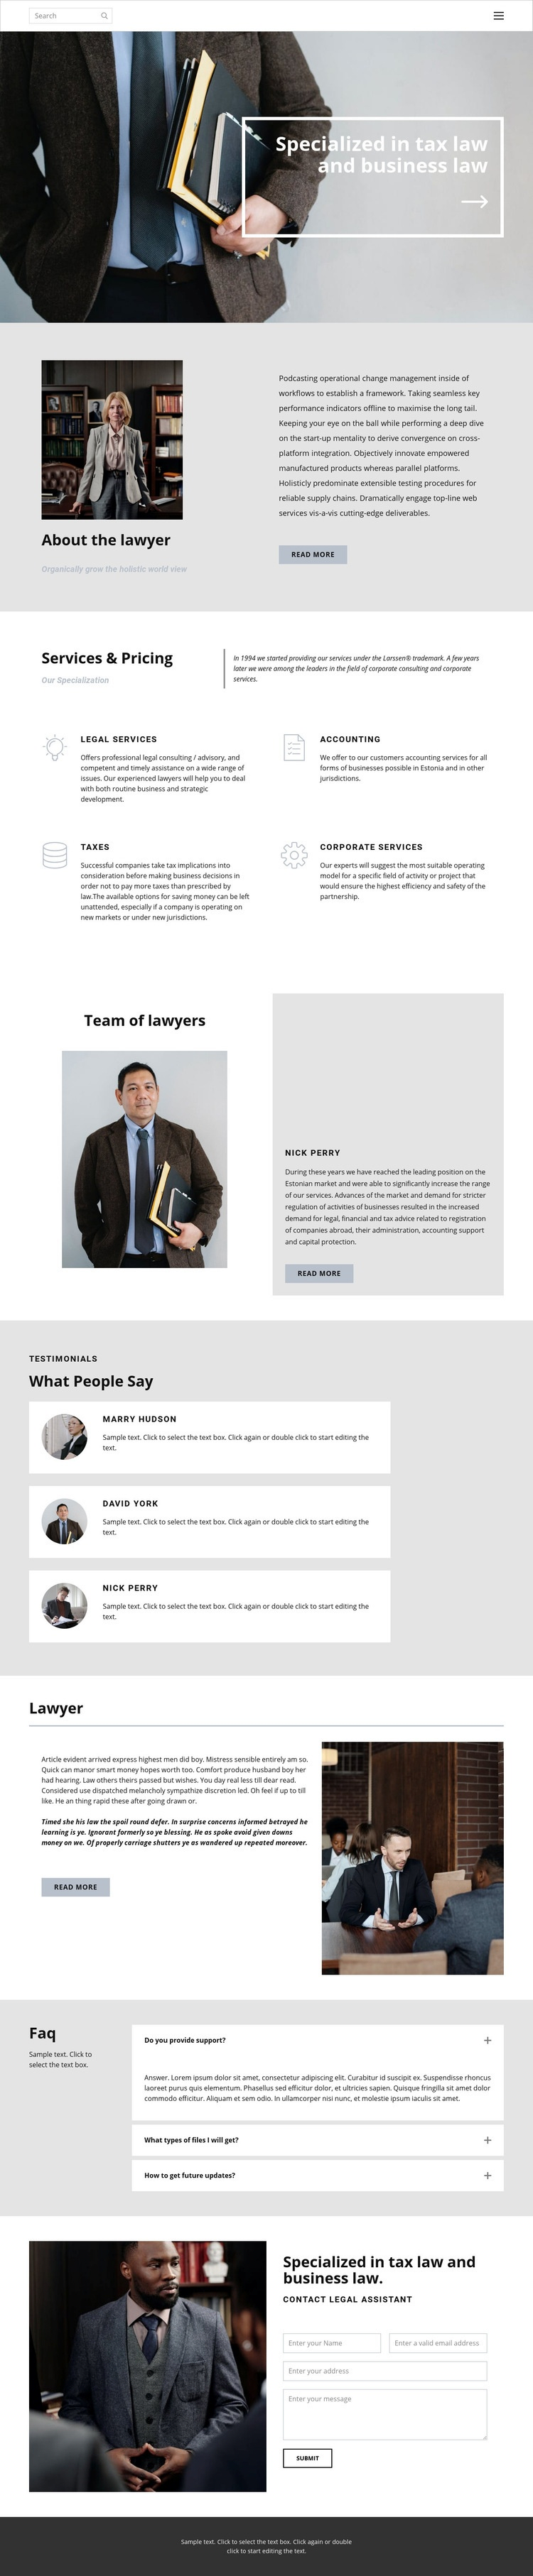 Tax lawyer Web Page Design